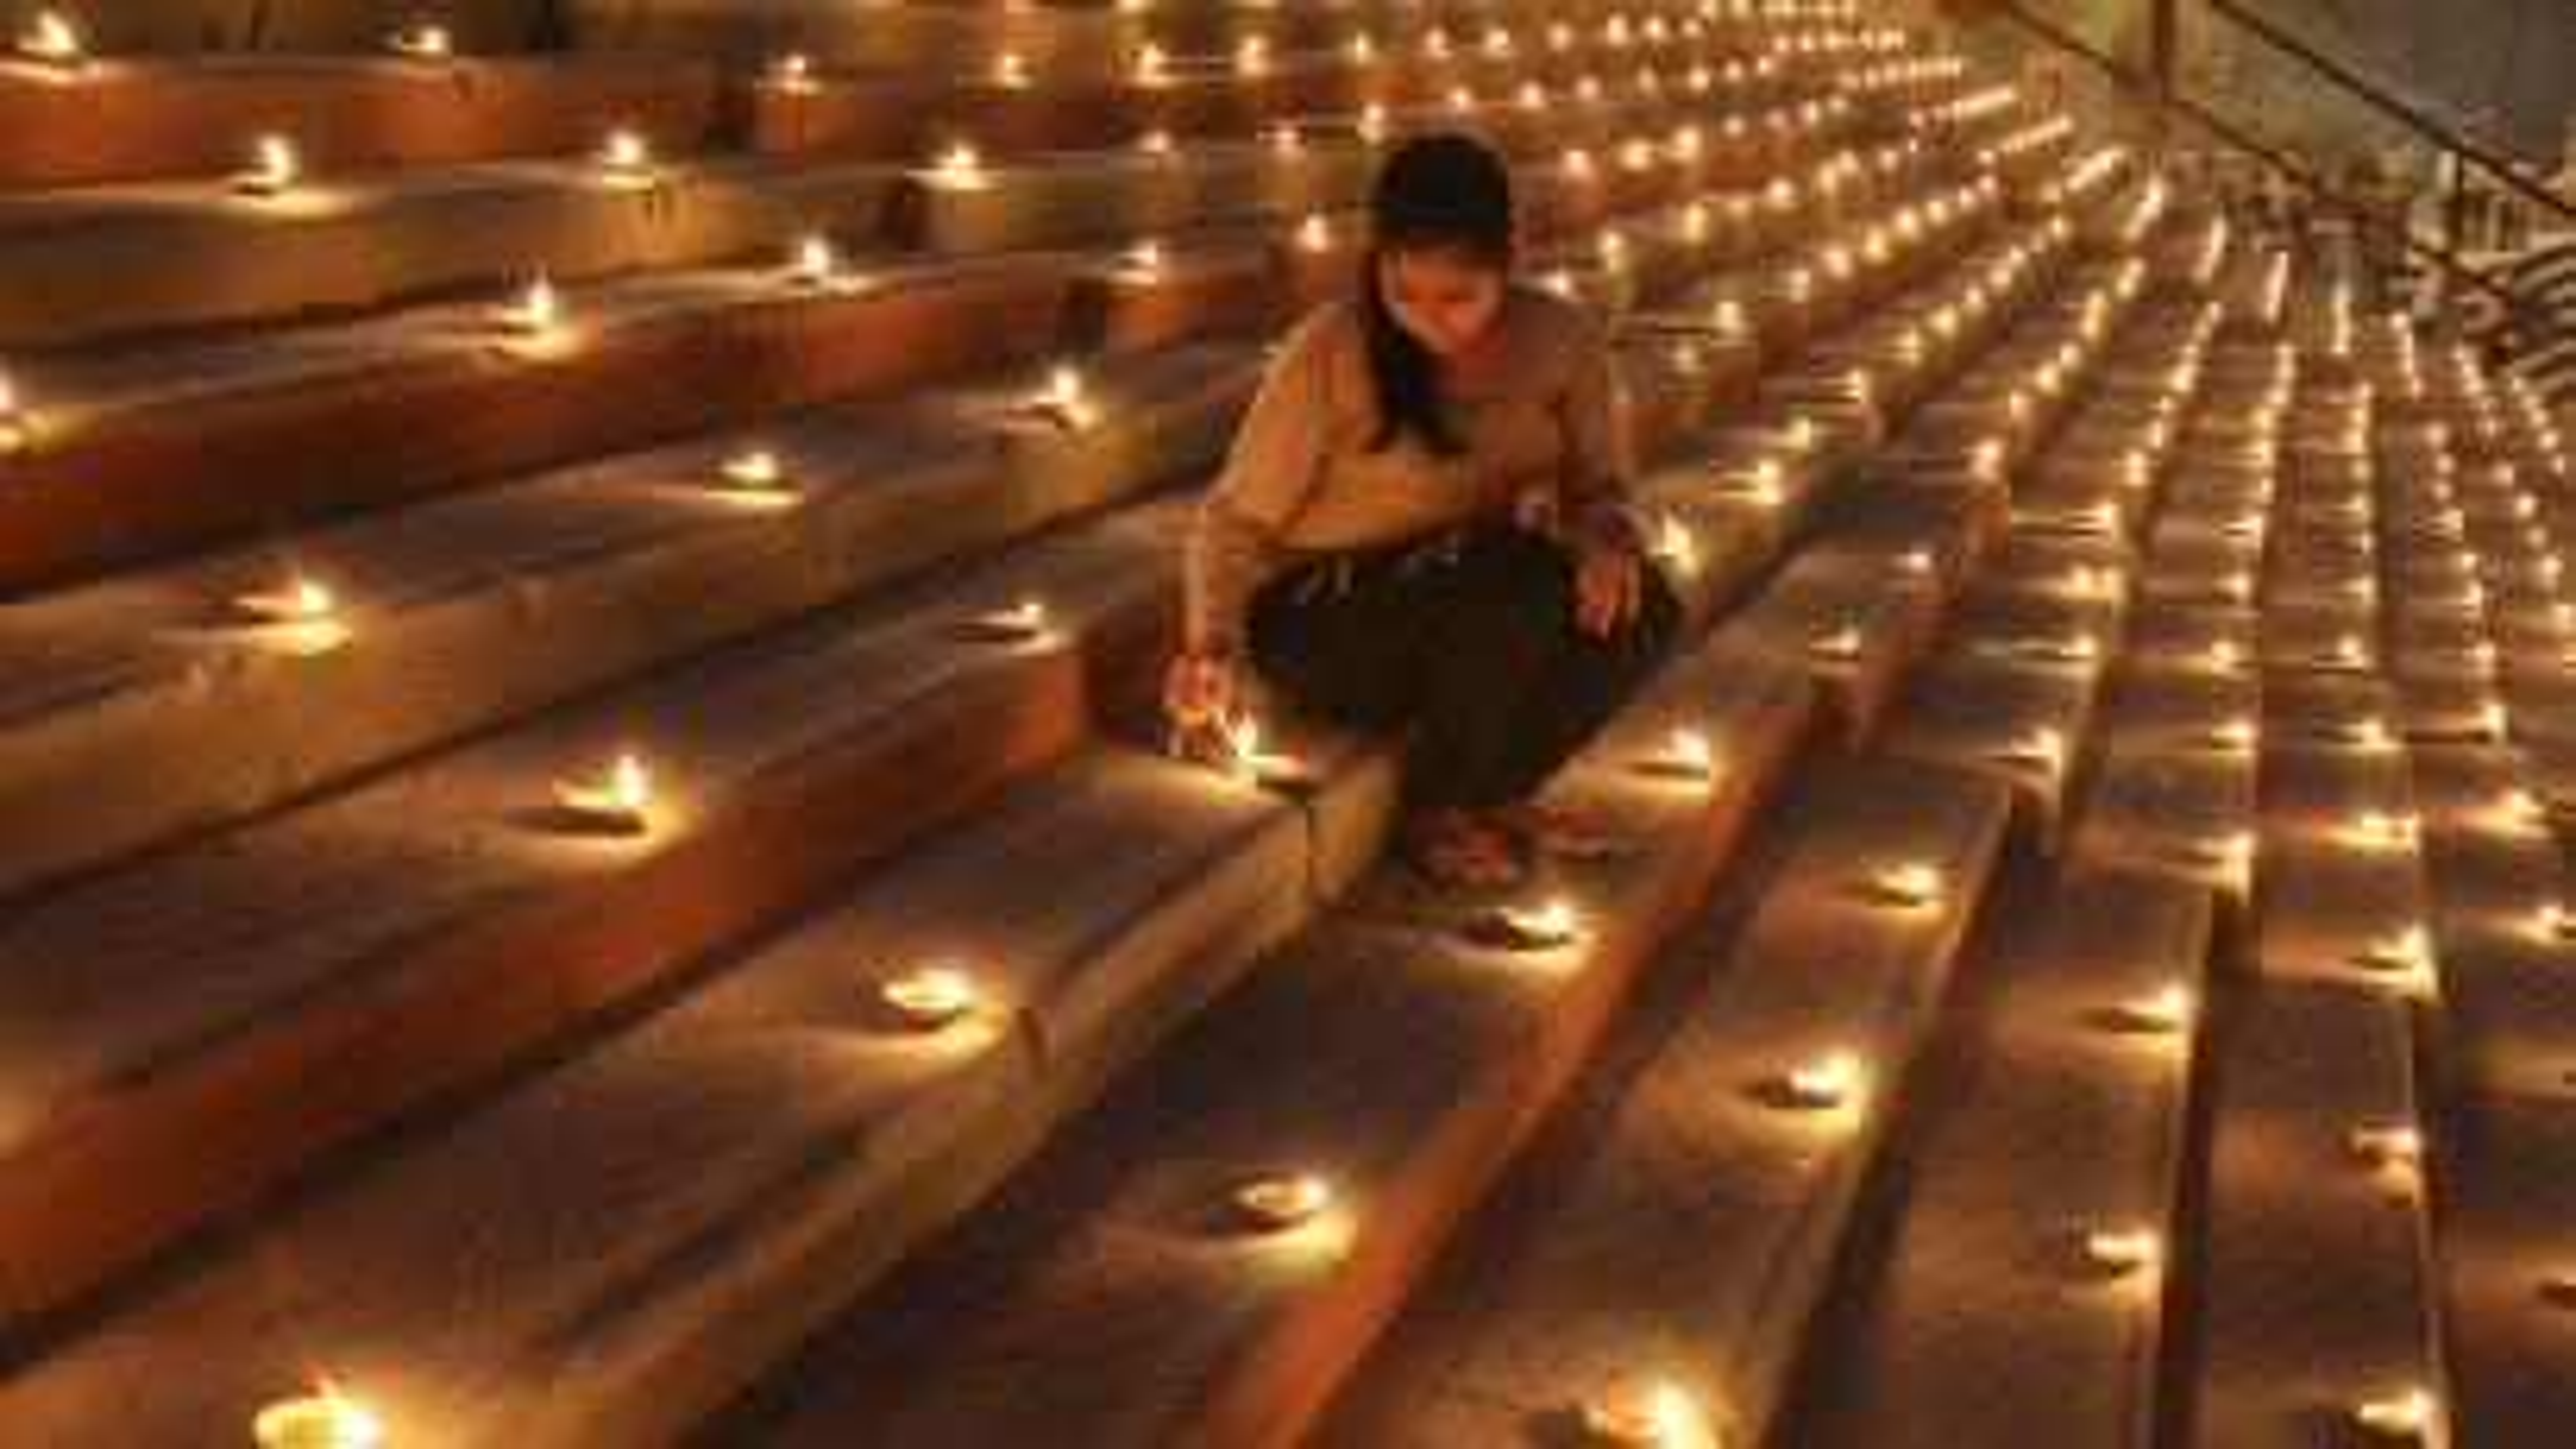 A Hindu devotee lights an earthen lamp on the steps of Sindhiya Ghat during the Karthik Purnima and Dev Diwali festival in Varanasi